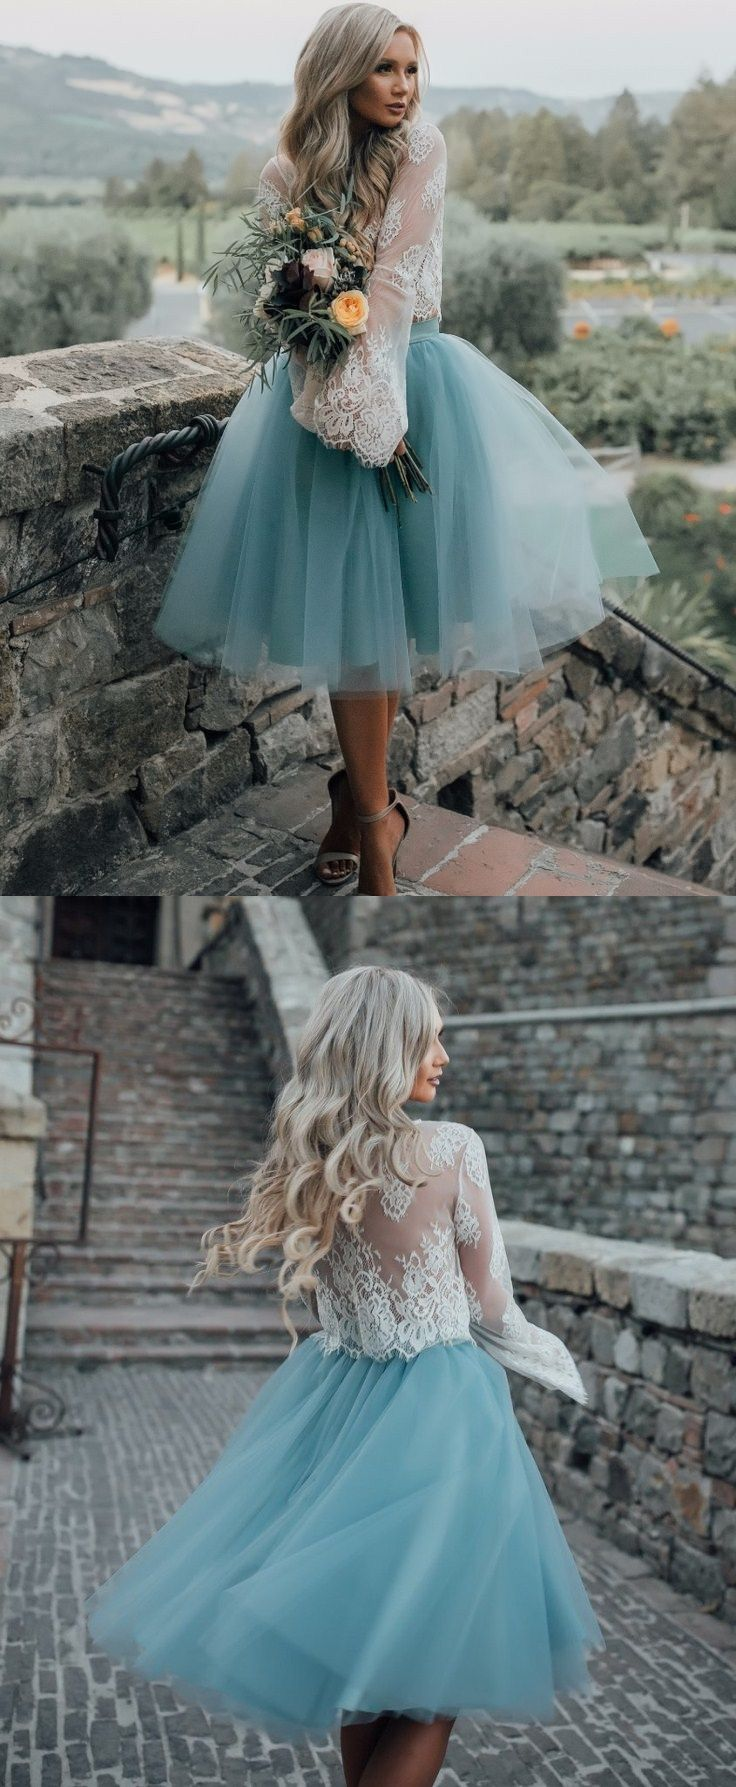 Dusty blue wedding dress  ALine Round Neck Flare Sleeves Sage Tulle Short Bridesmaid Dress